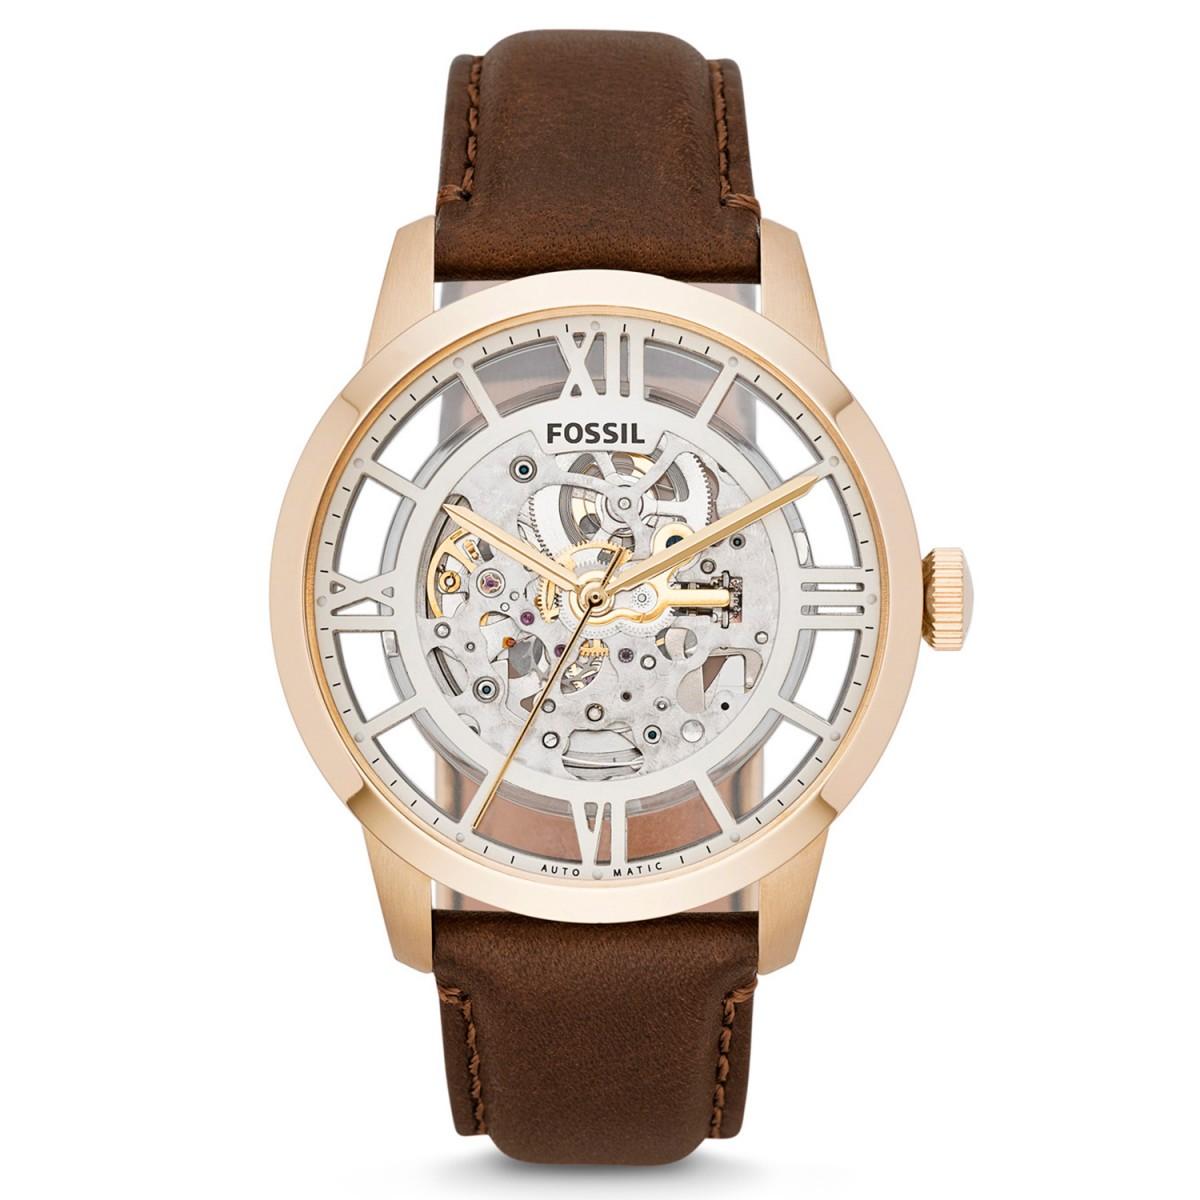 Compre Relógio Fossil Townsman Automático em 10X   Tri-Jóia Shop f1b37cd777